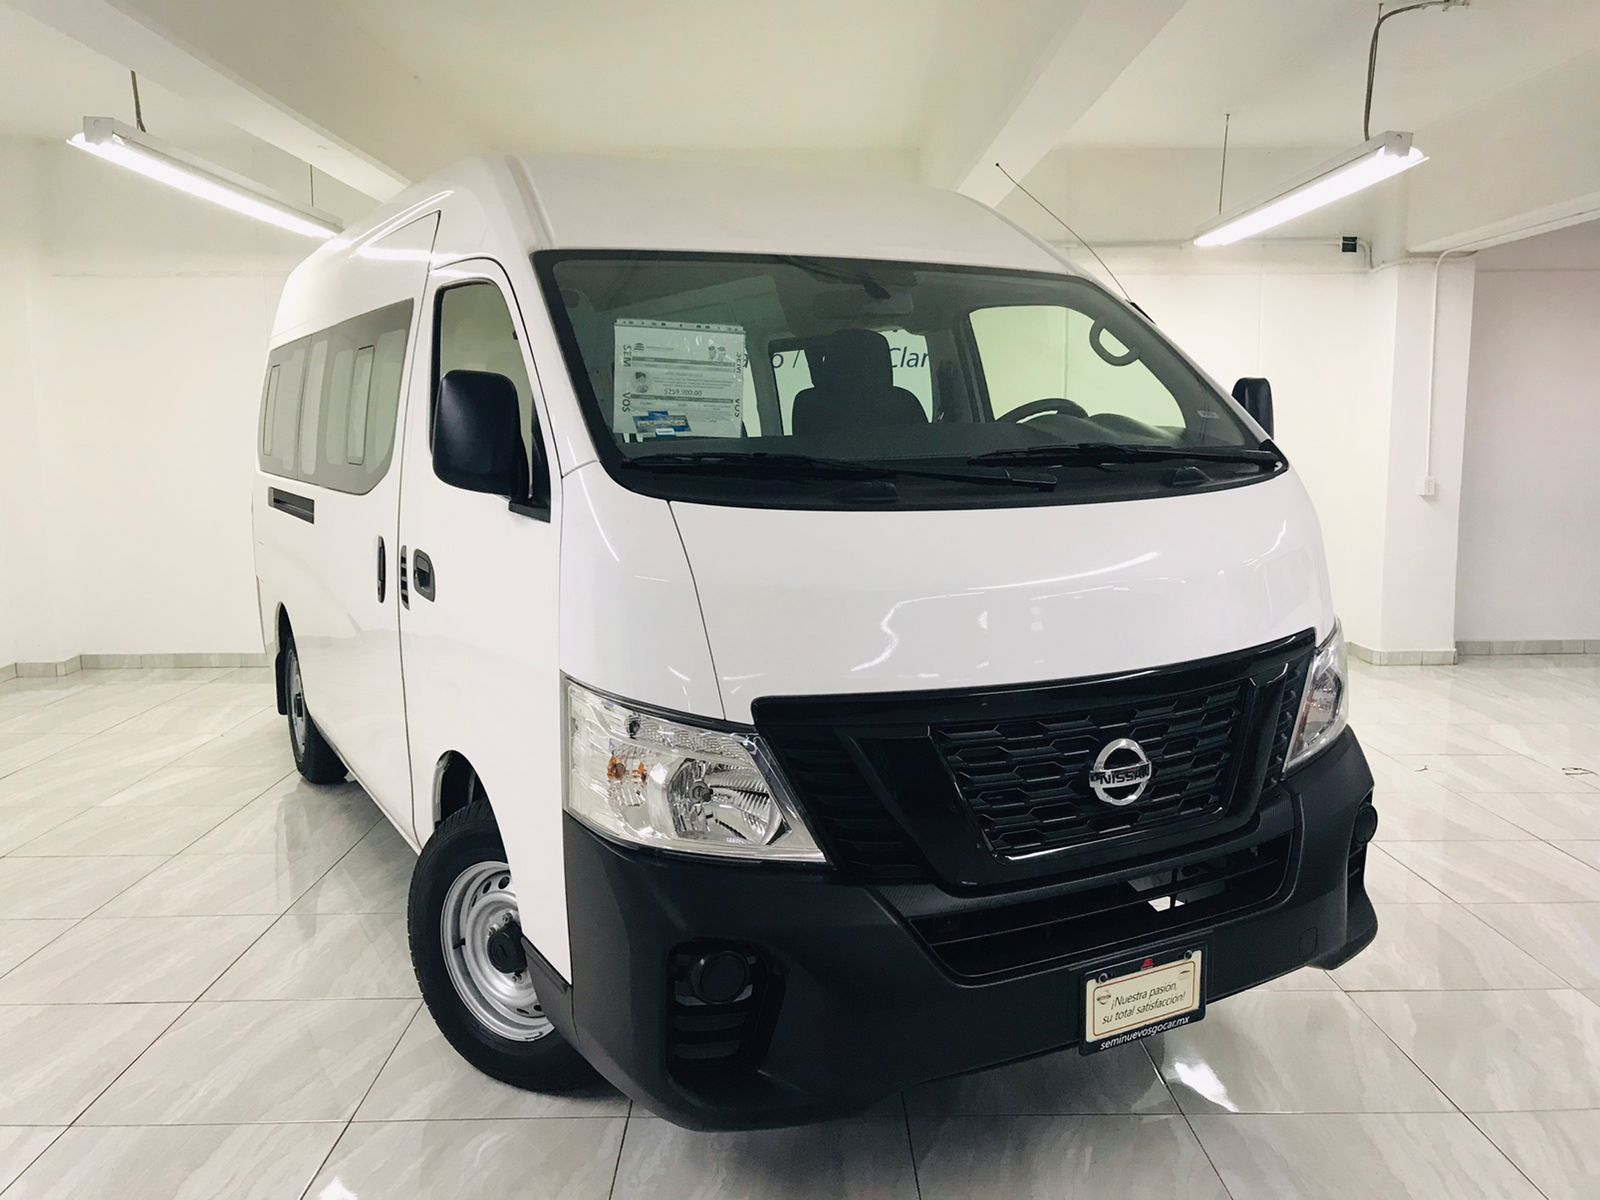 Nissan Urvan PANEL 4 VENTANAS AMPLIAS PAQ SEG 2021